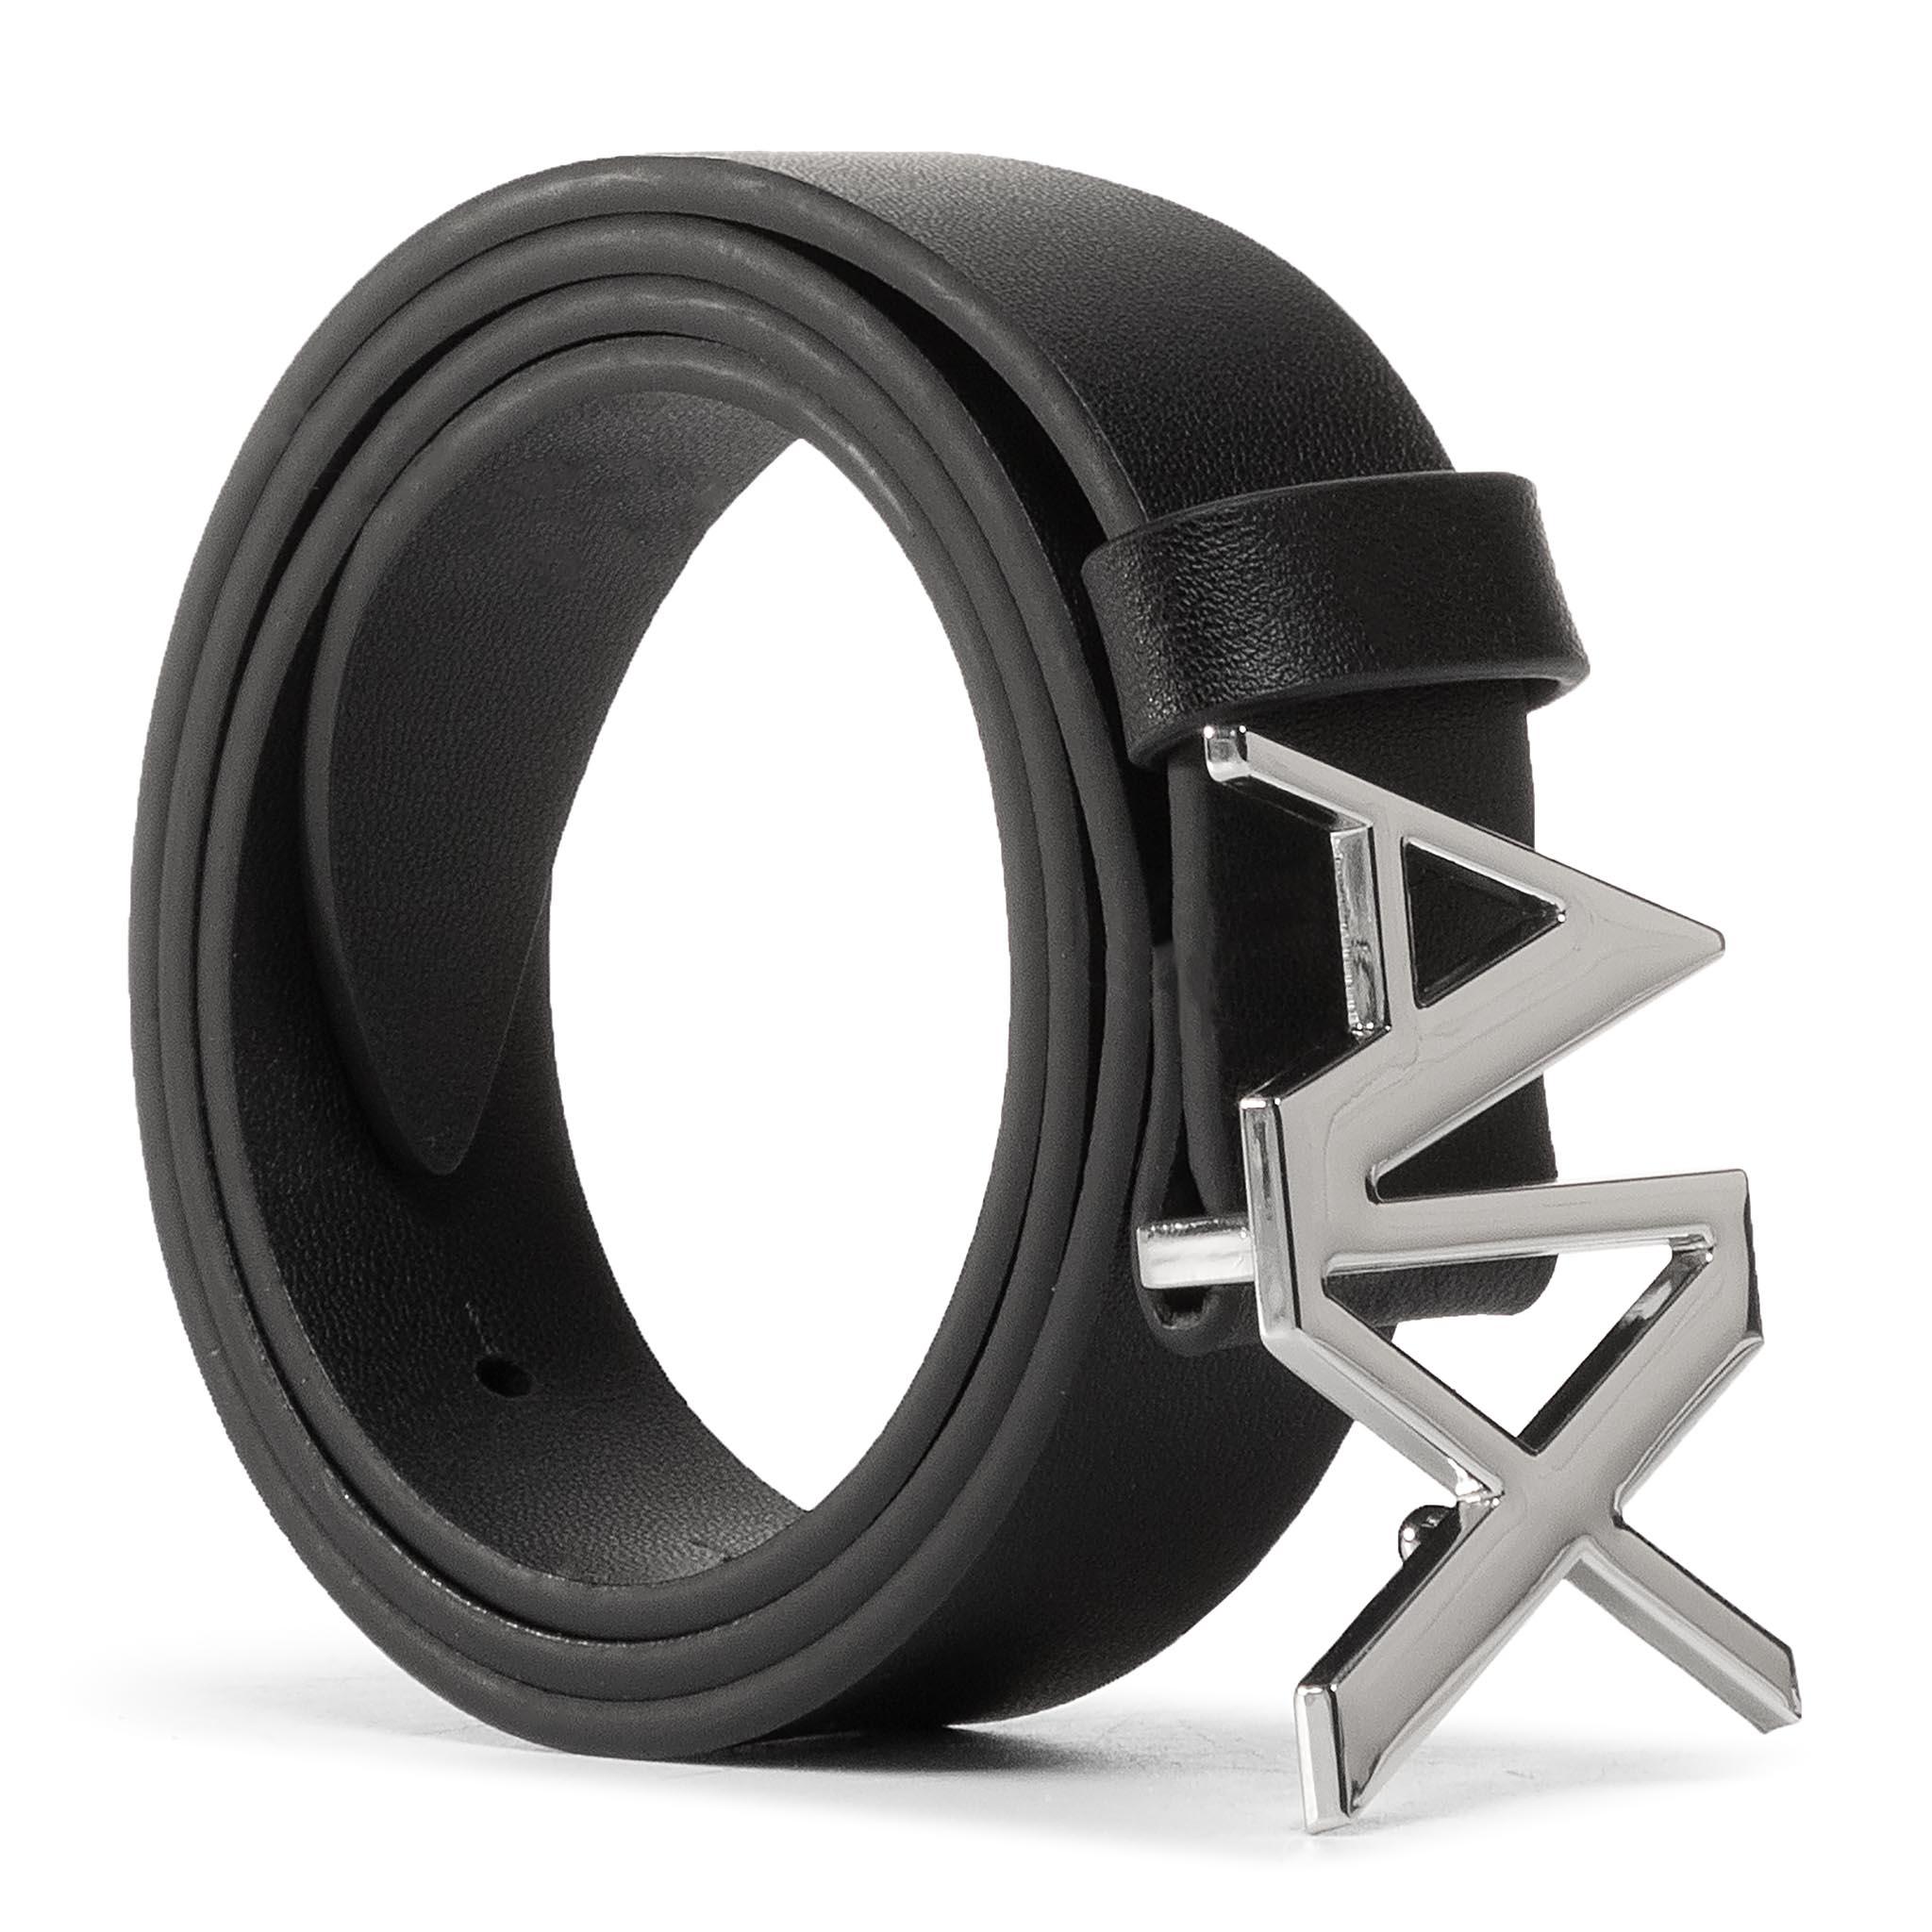 Image of Damengürtel ARMANI EXCHANGE - 941125 CC719 00020 Black